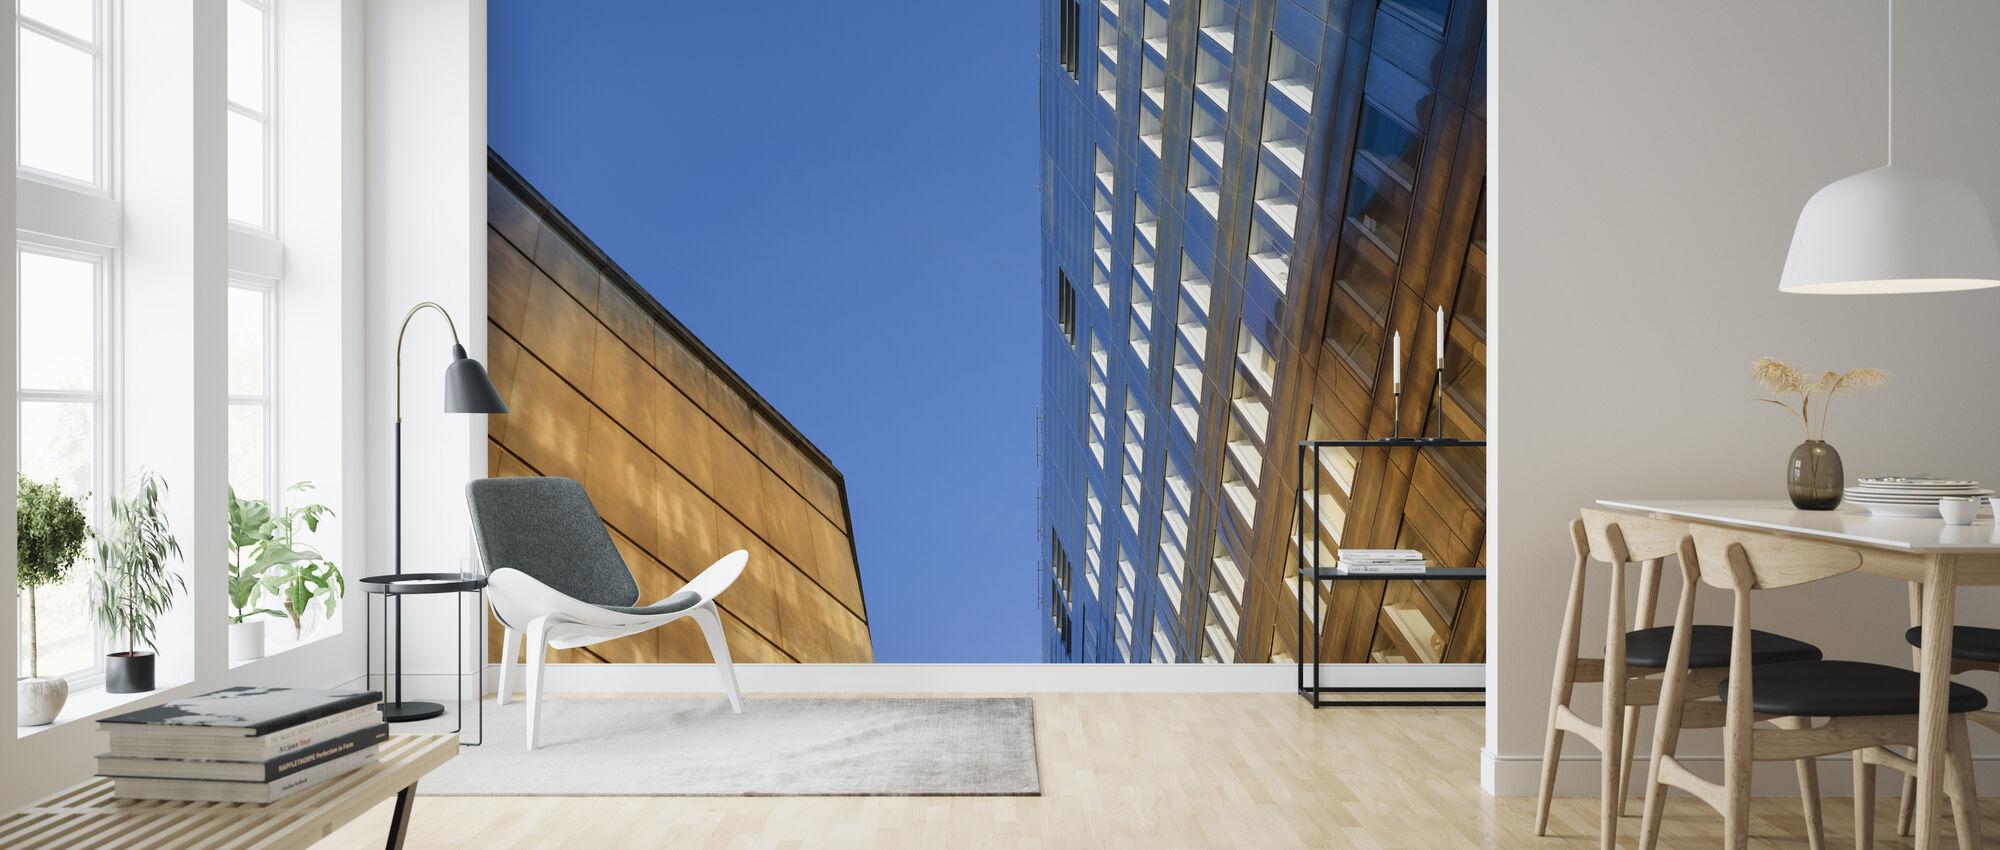 Architectural Details in Drottninggatan Stockholm - Wallpaper - Living Room